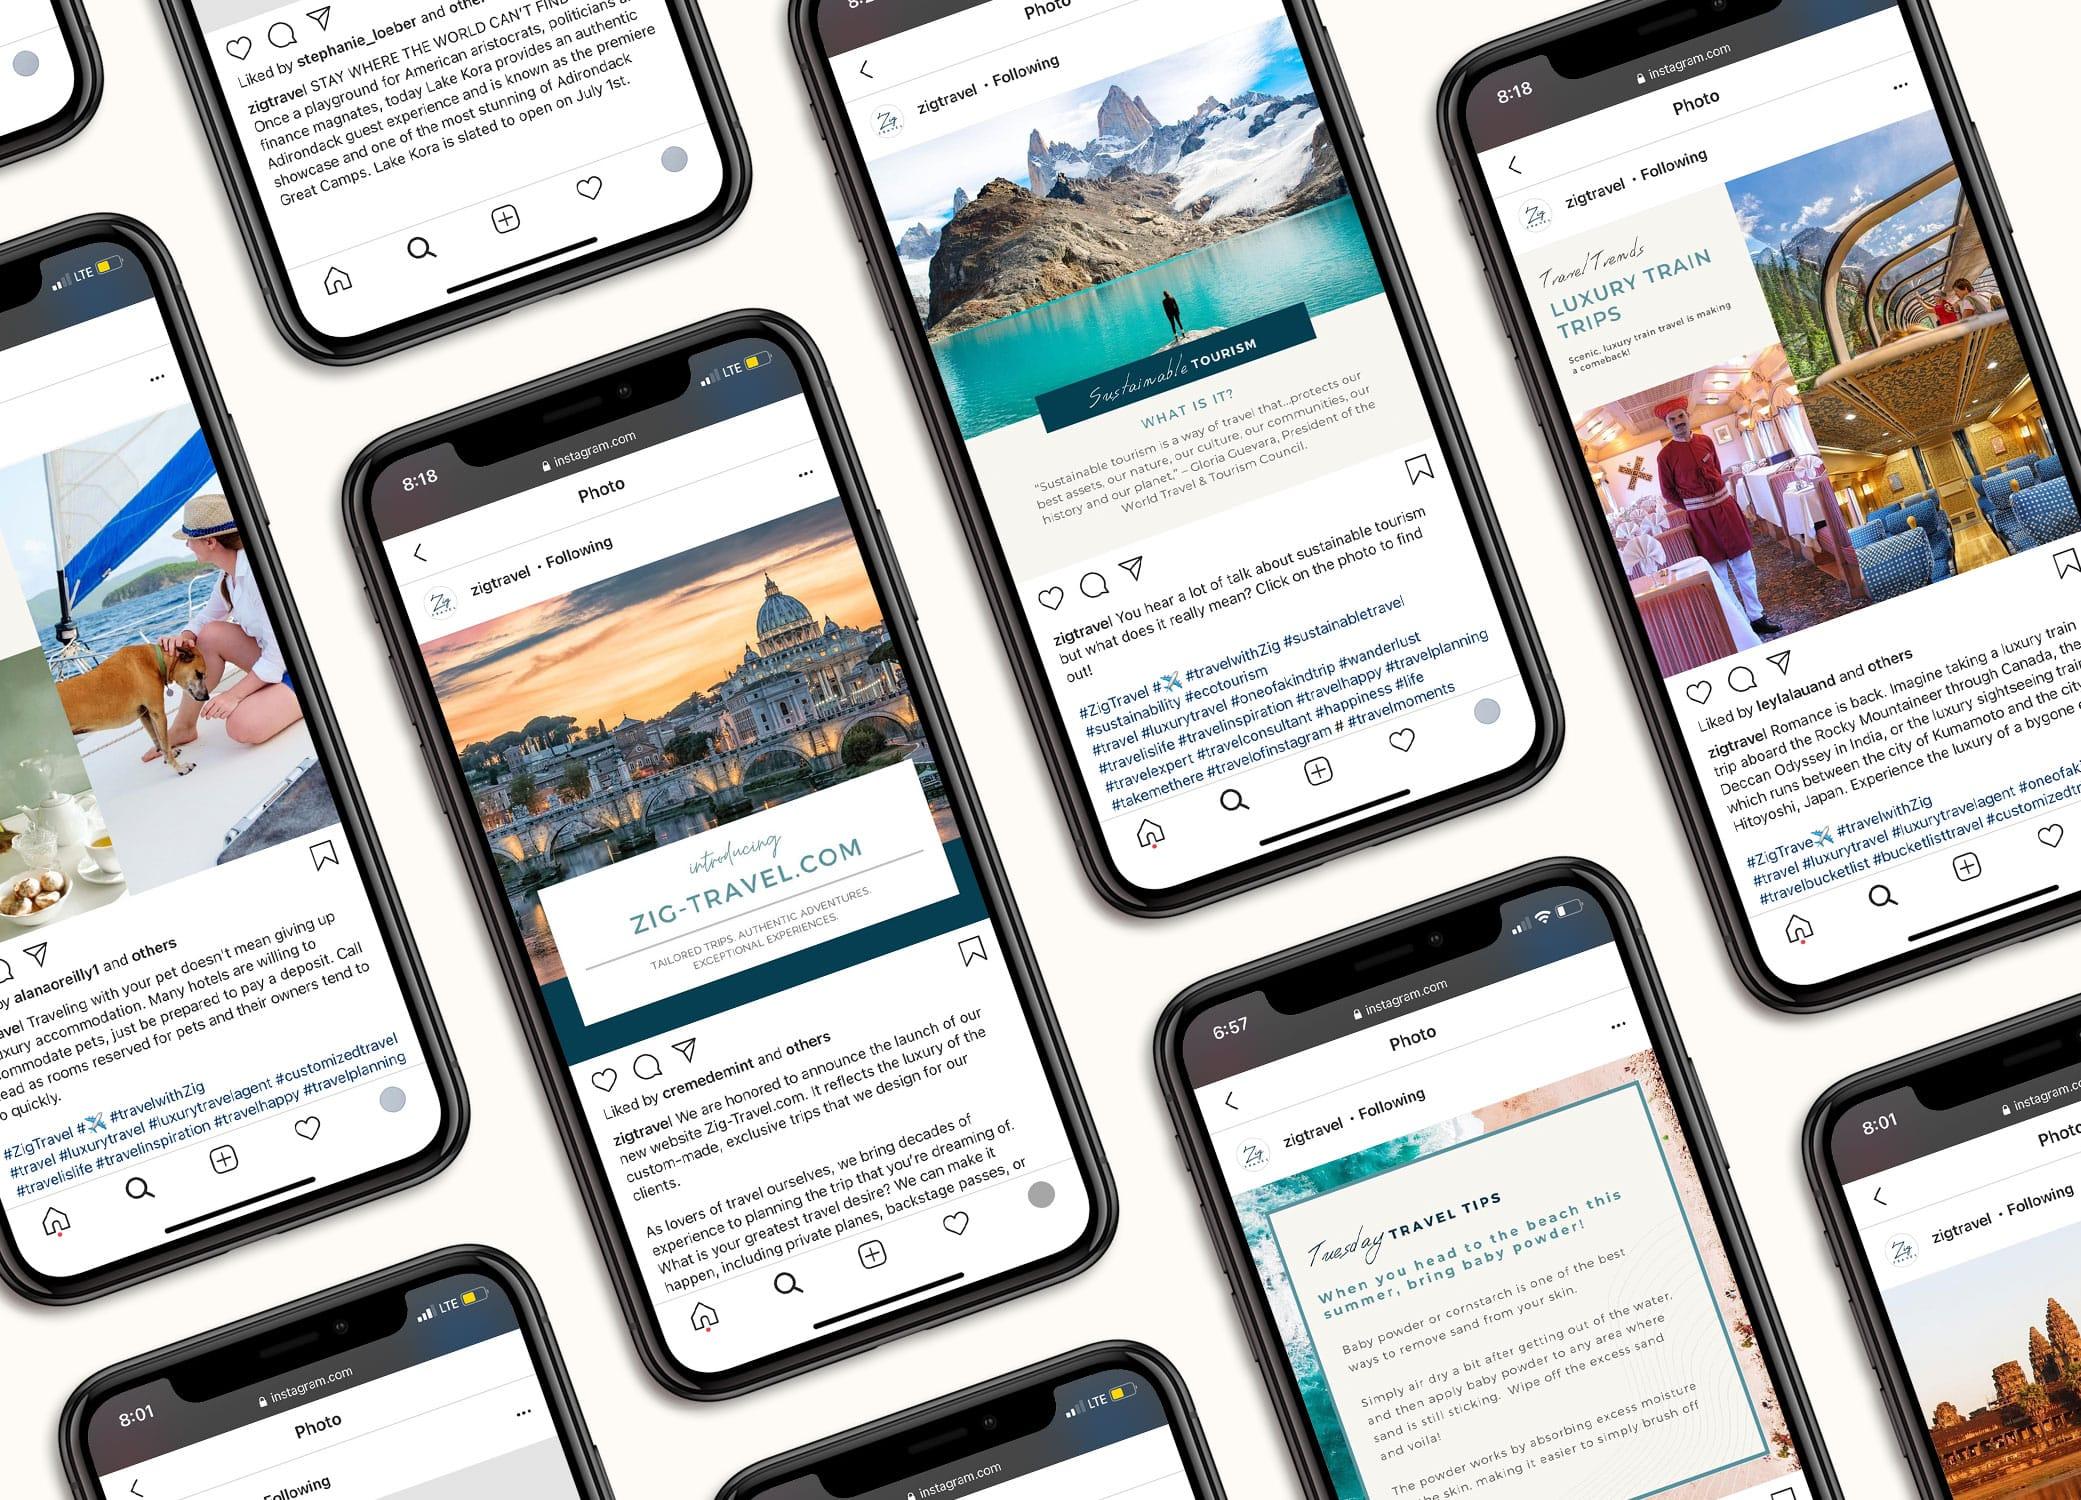 Zig Travel social media branding images in iPhone mockup displayed in alternating rows.